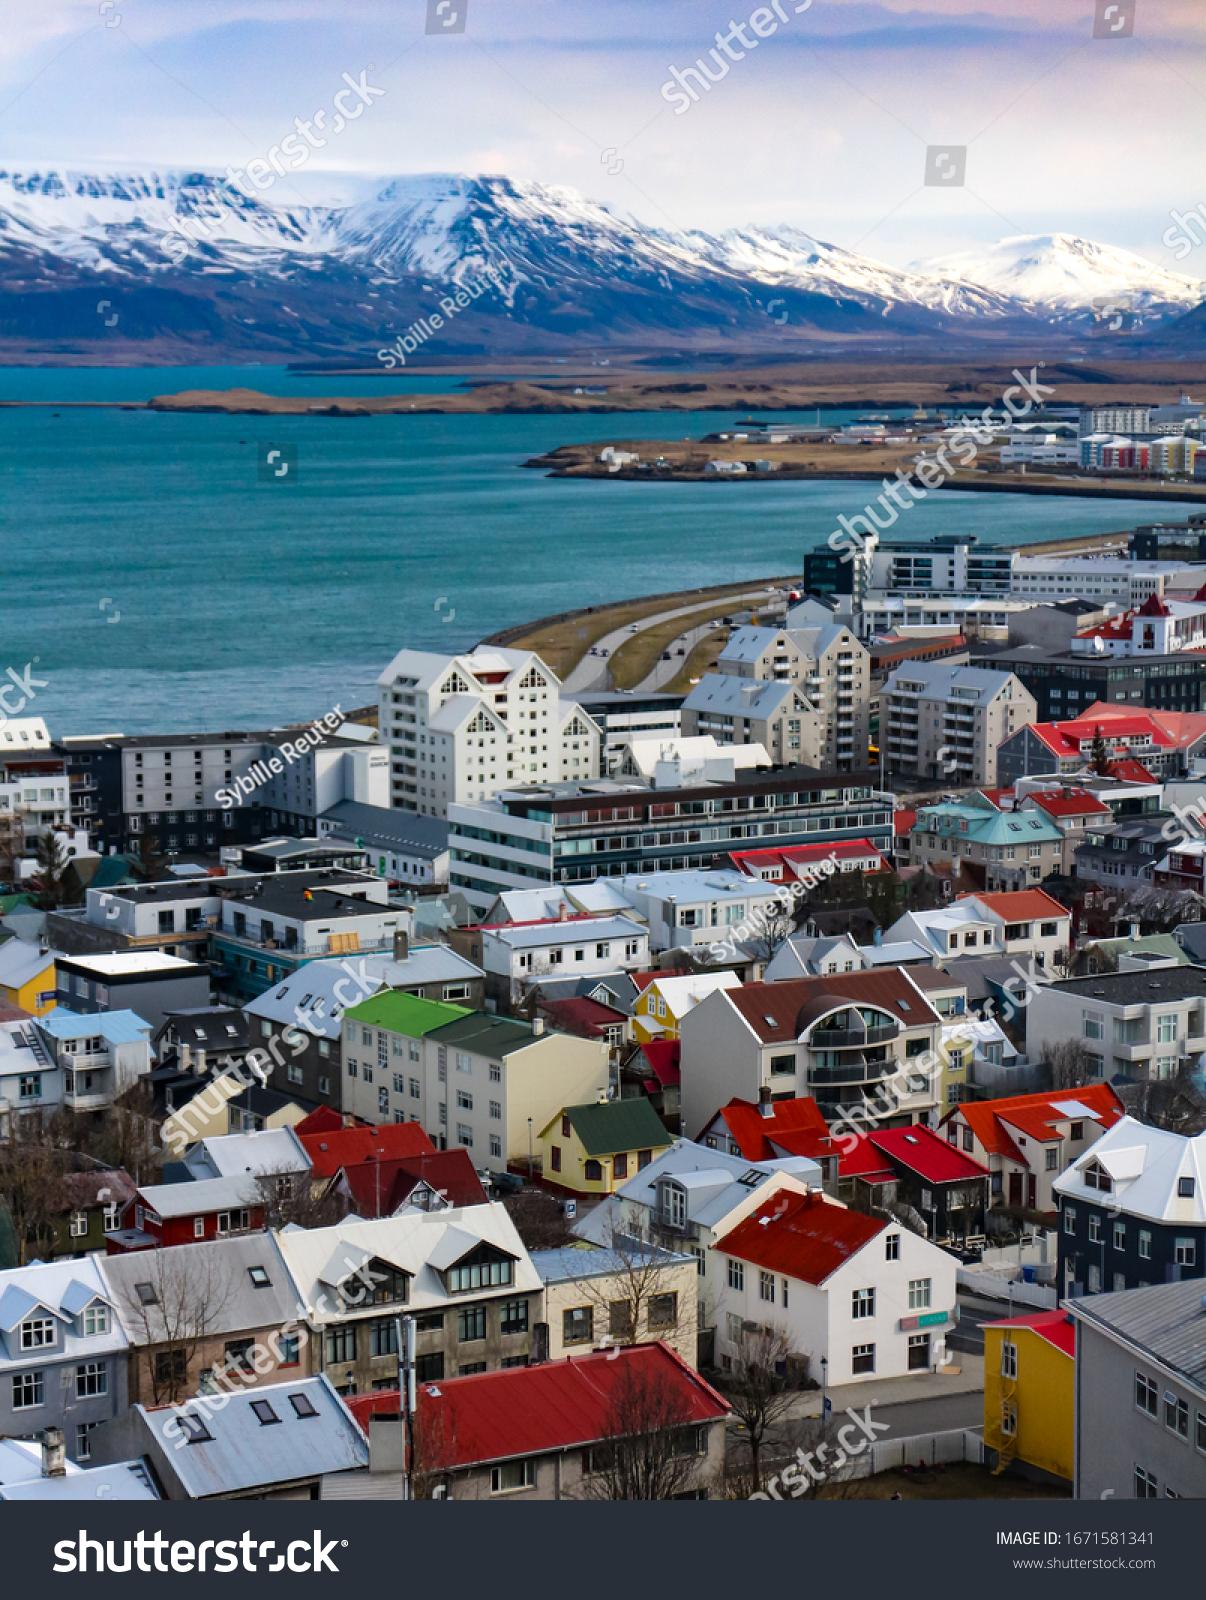 stock-photo-reykjavik-iceland-april-view